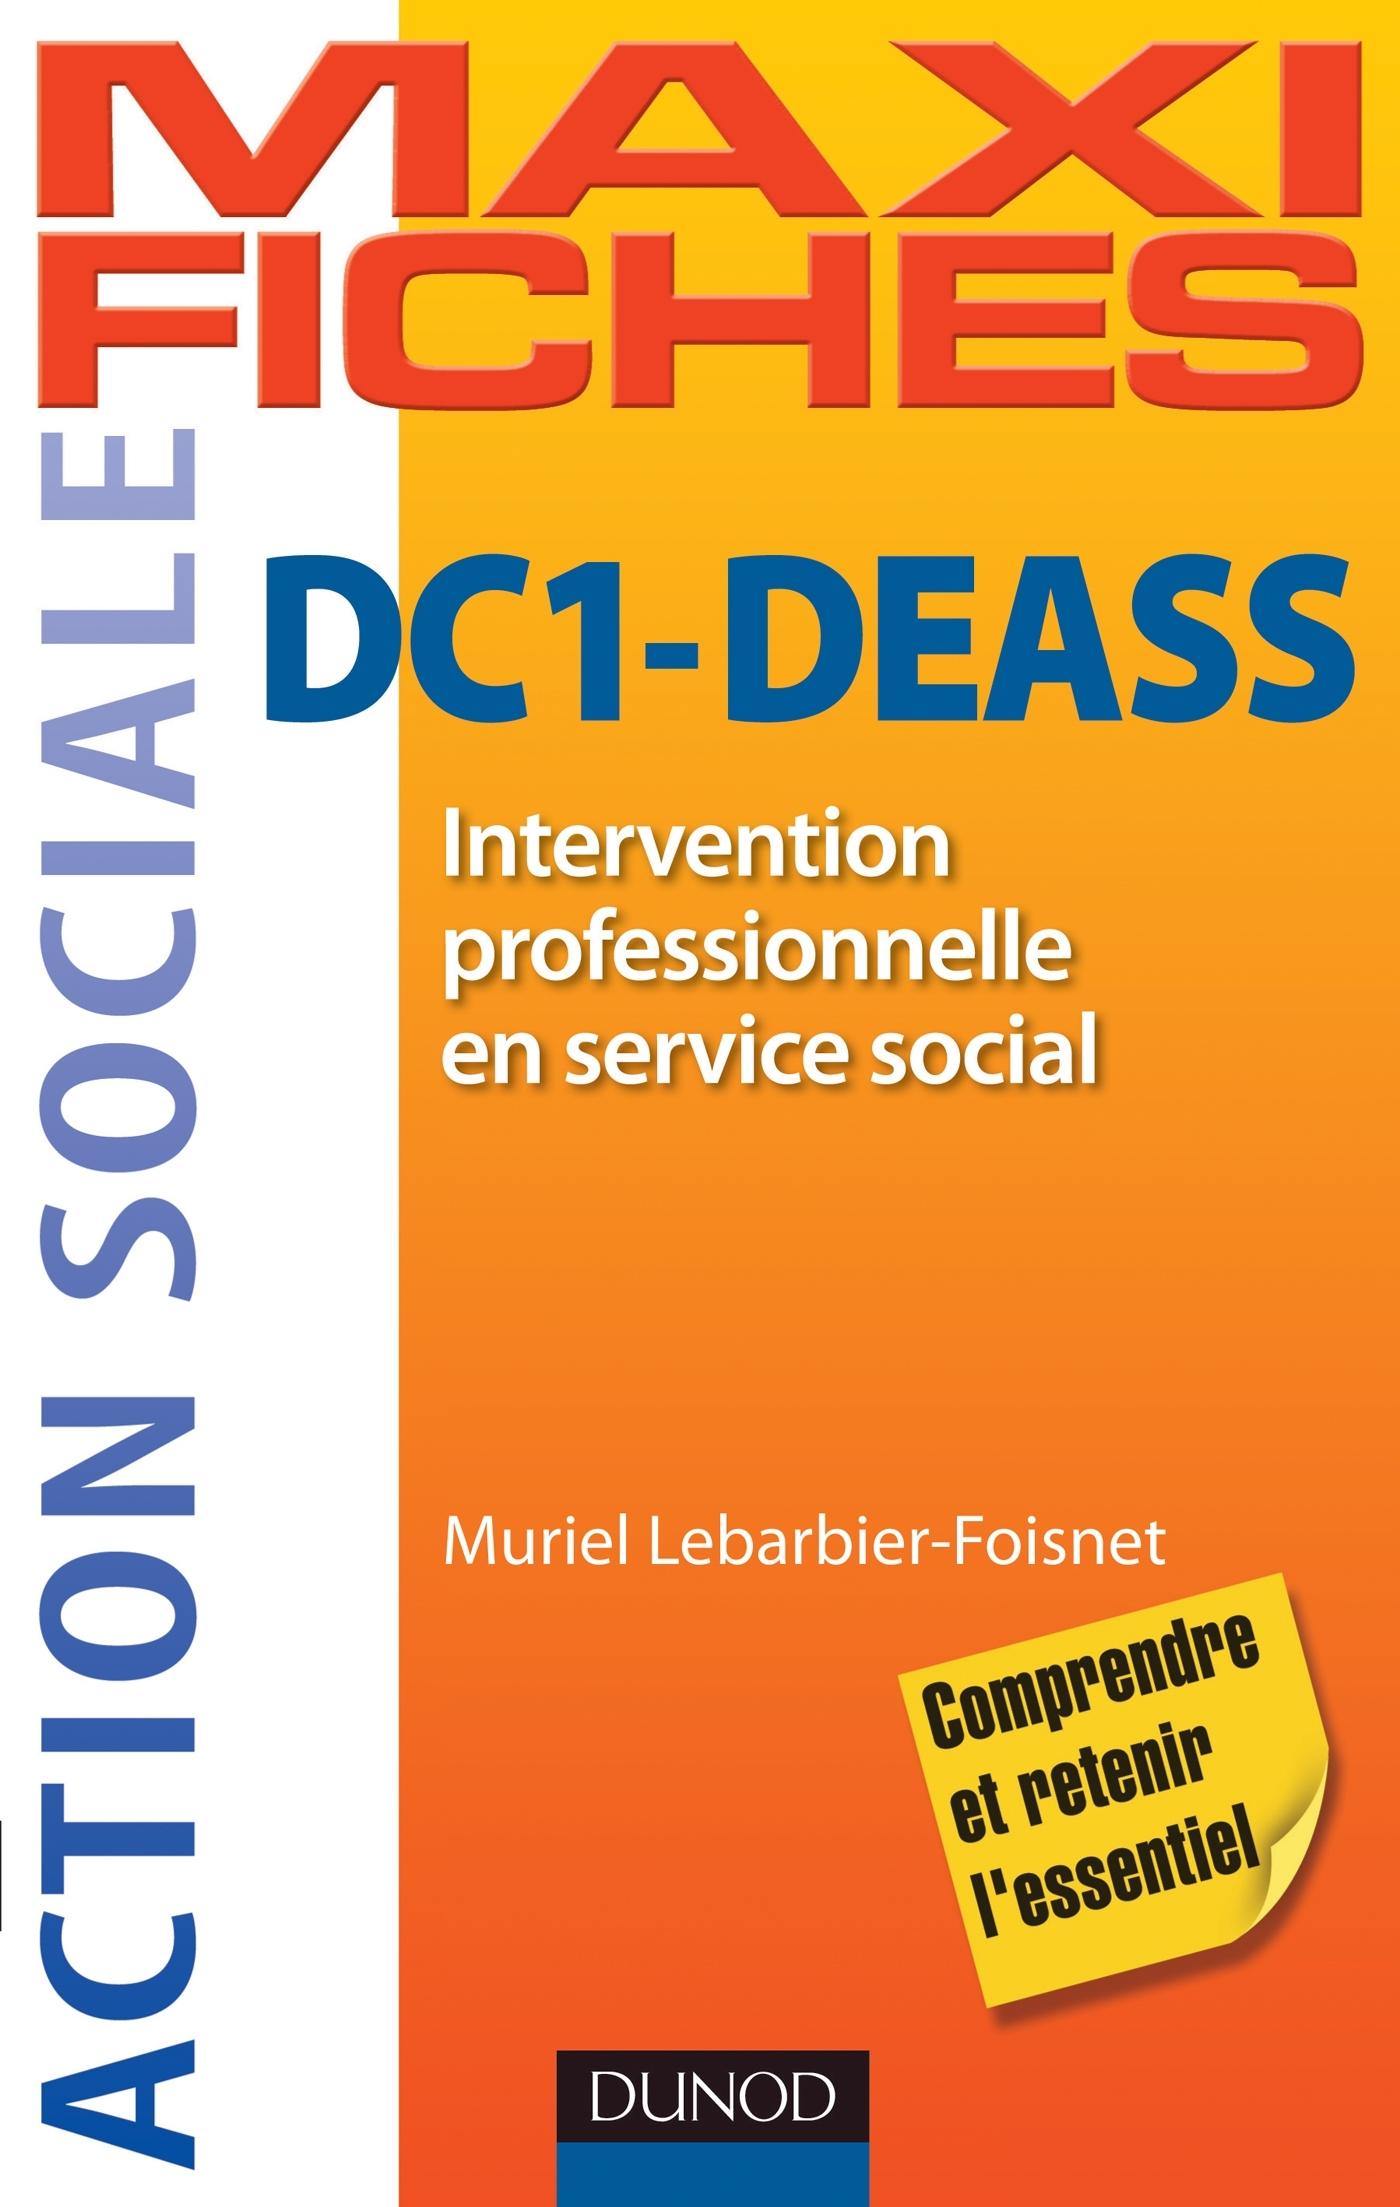 DC1 INTERVENTION PROFESSIONNELLE EN SERVICE SOCIAL DEASS - ISAP, ISIC, AUTO-EVALUATION, METHODOLOGIE